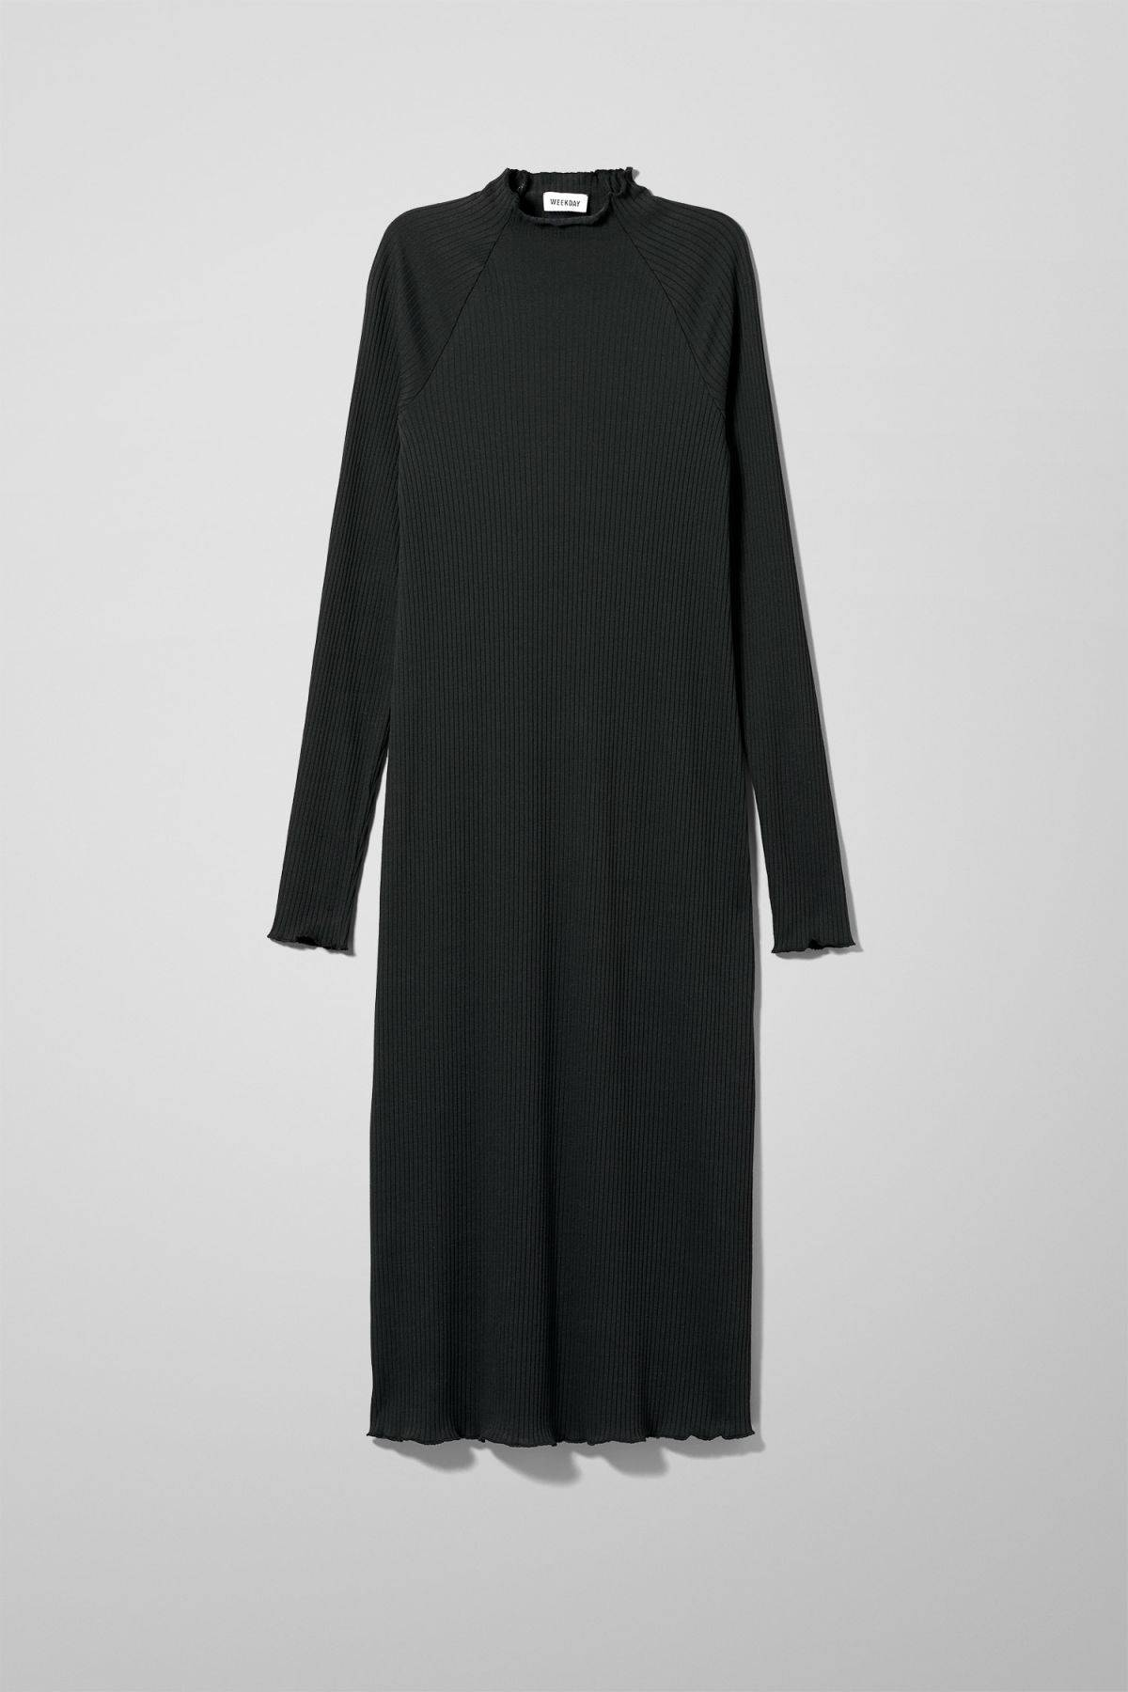 Image of Loretta Dress - Black-XS